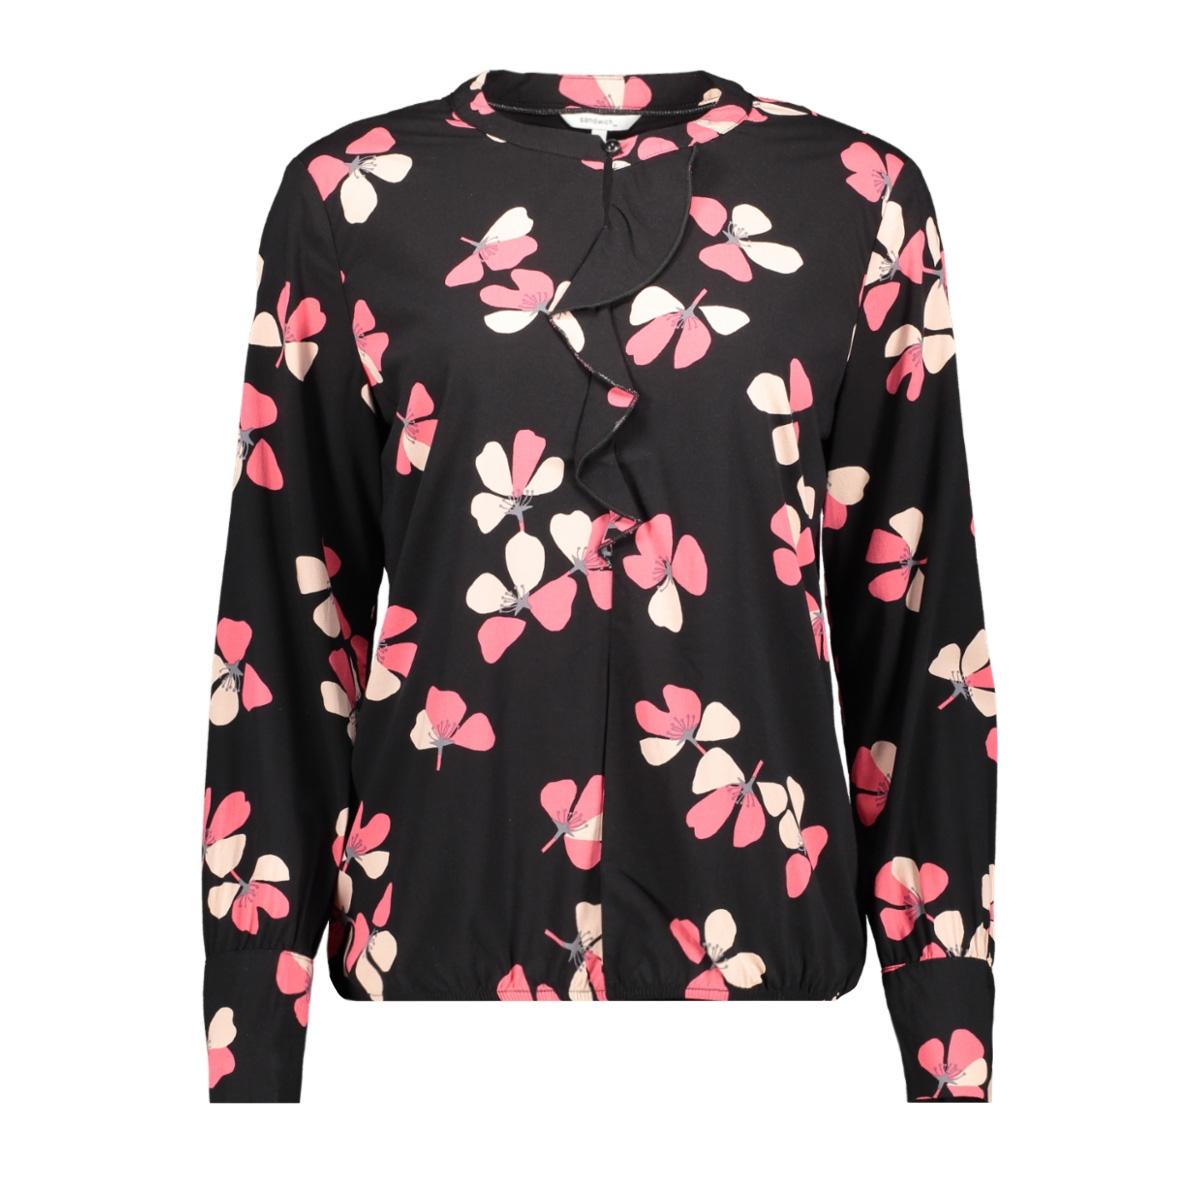 top met ruffles en bloemenprint 22001771 sandwich blouse 20150